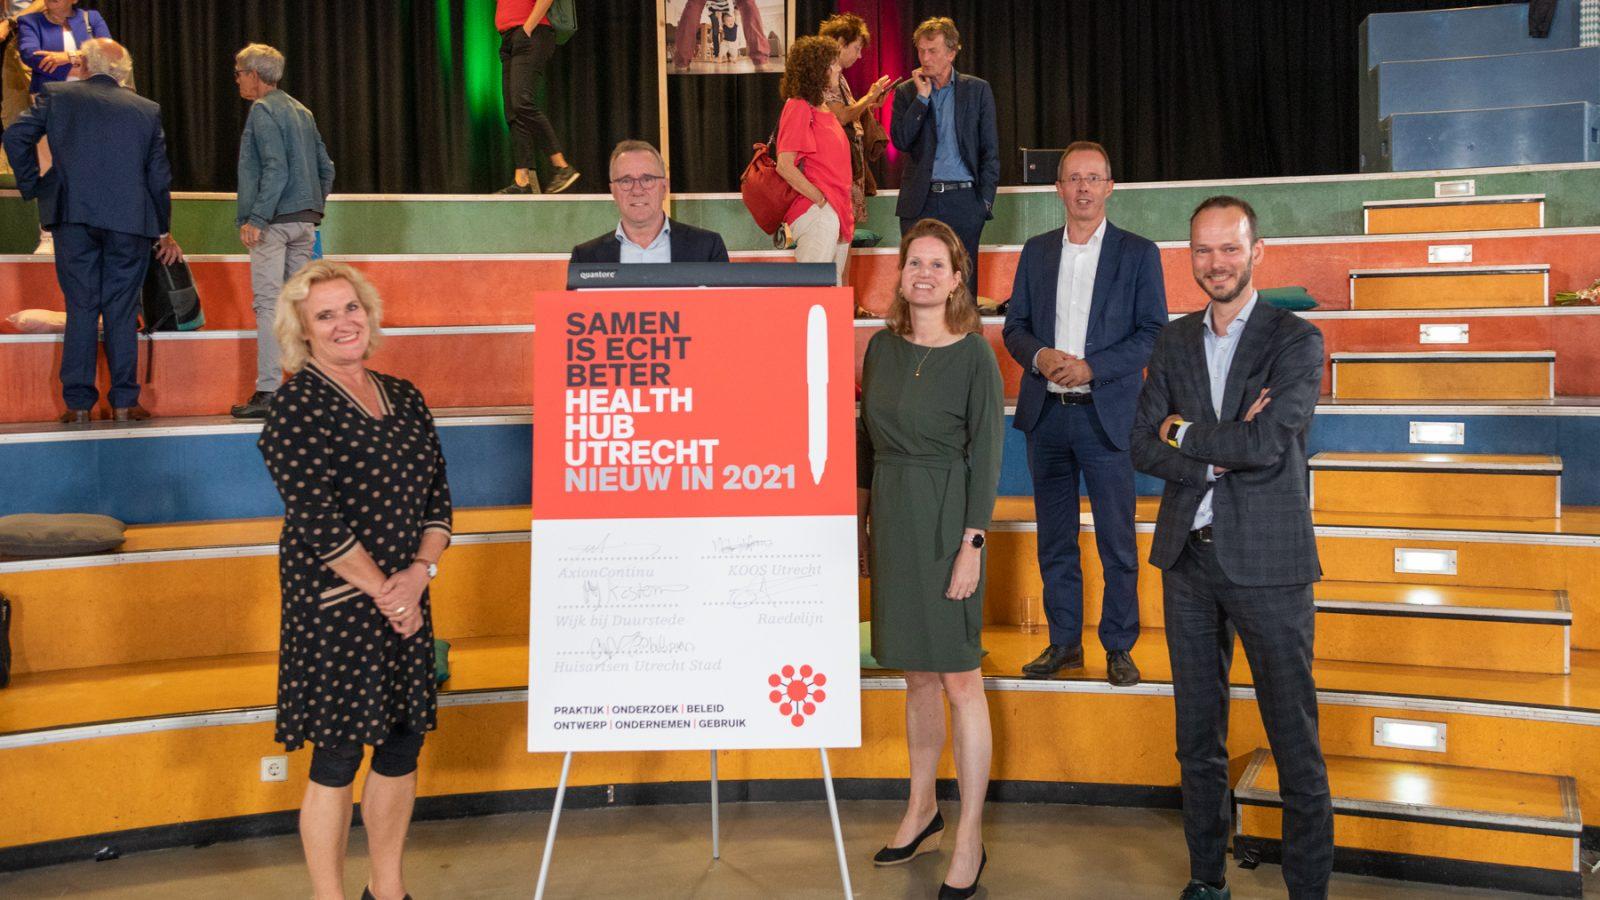 Ondertekening Health Hub Utrecht partners 2021